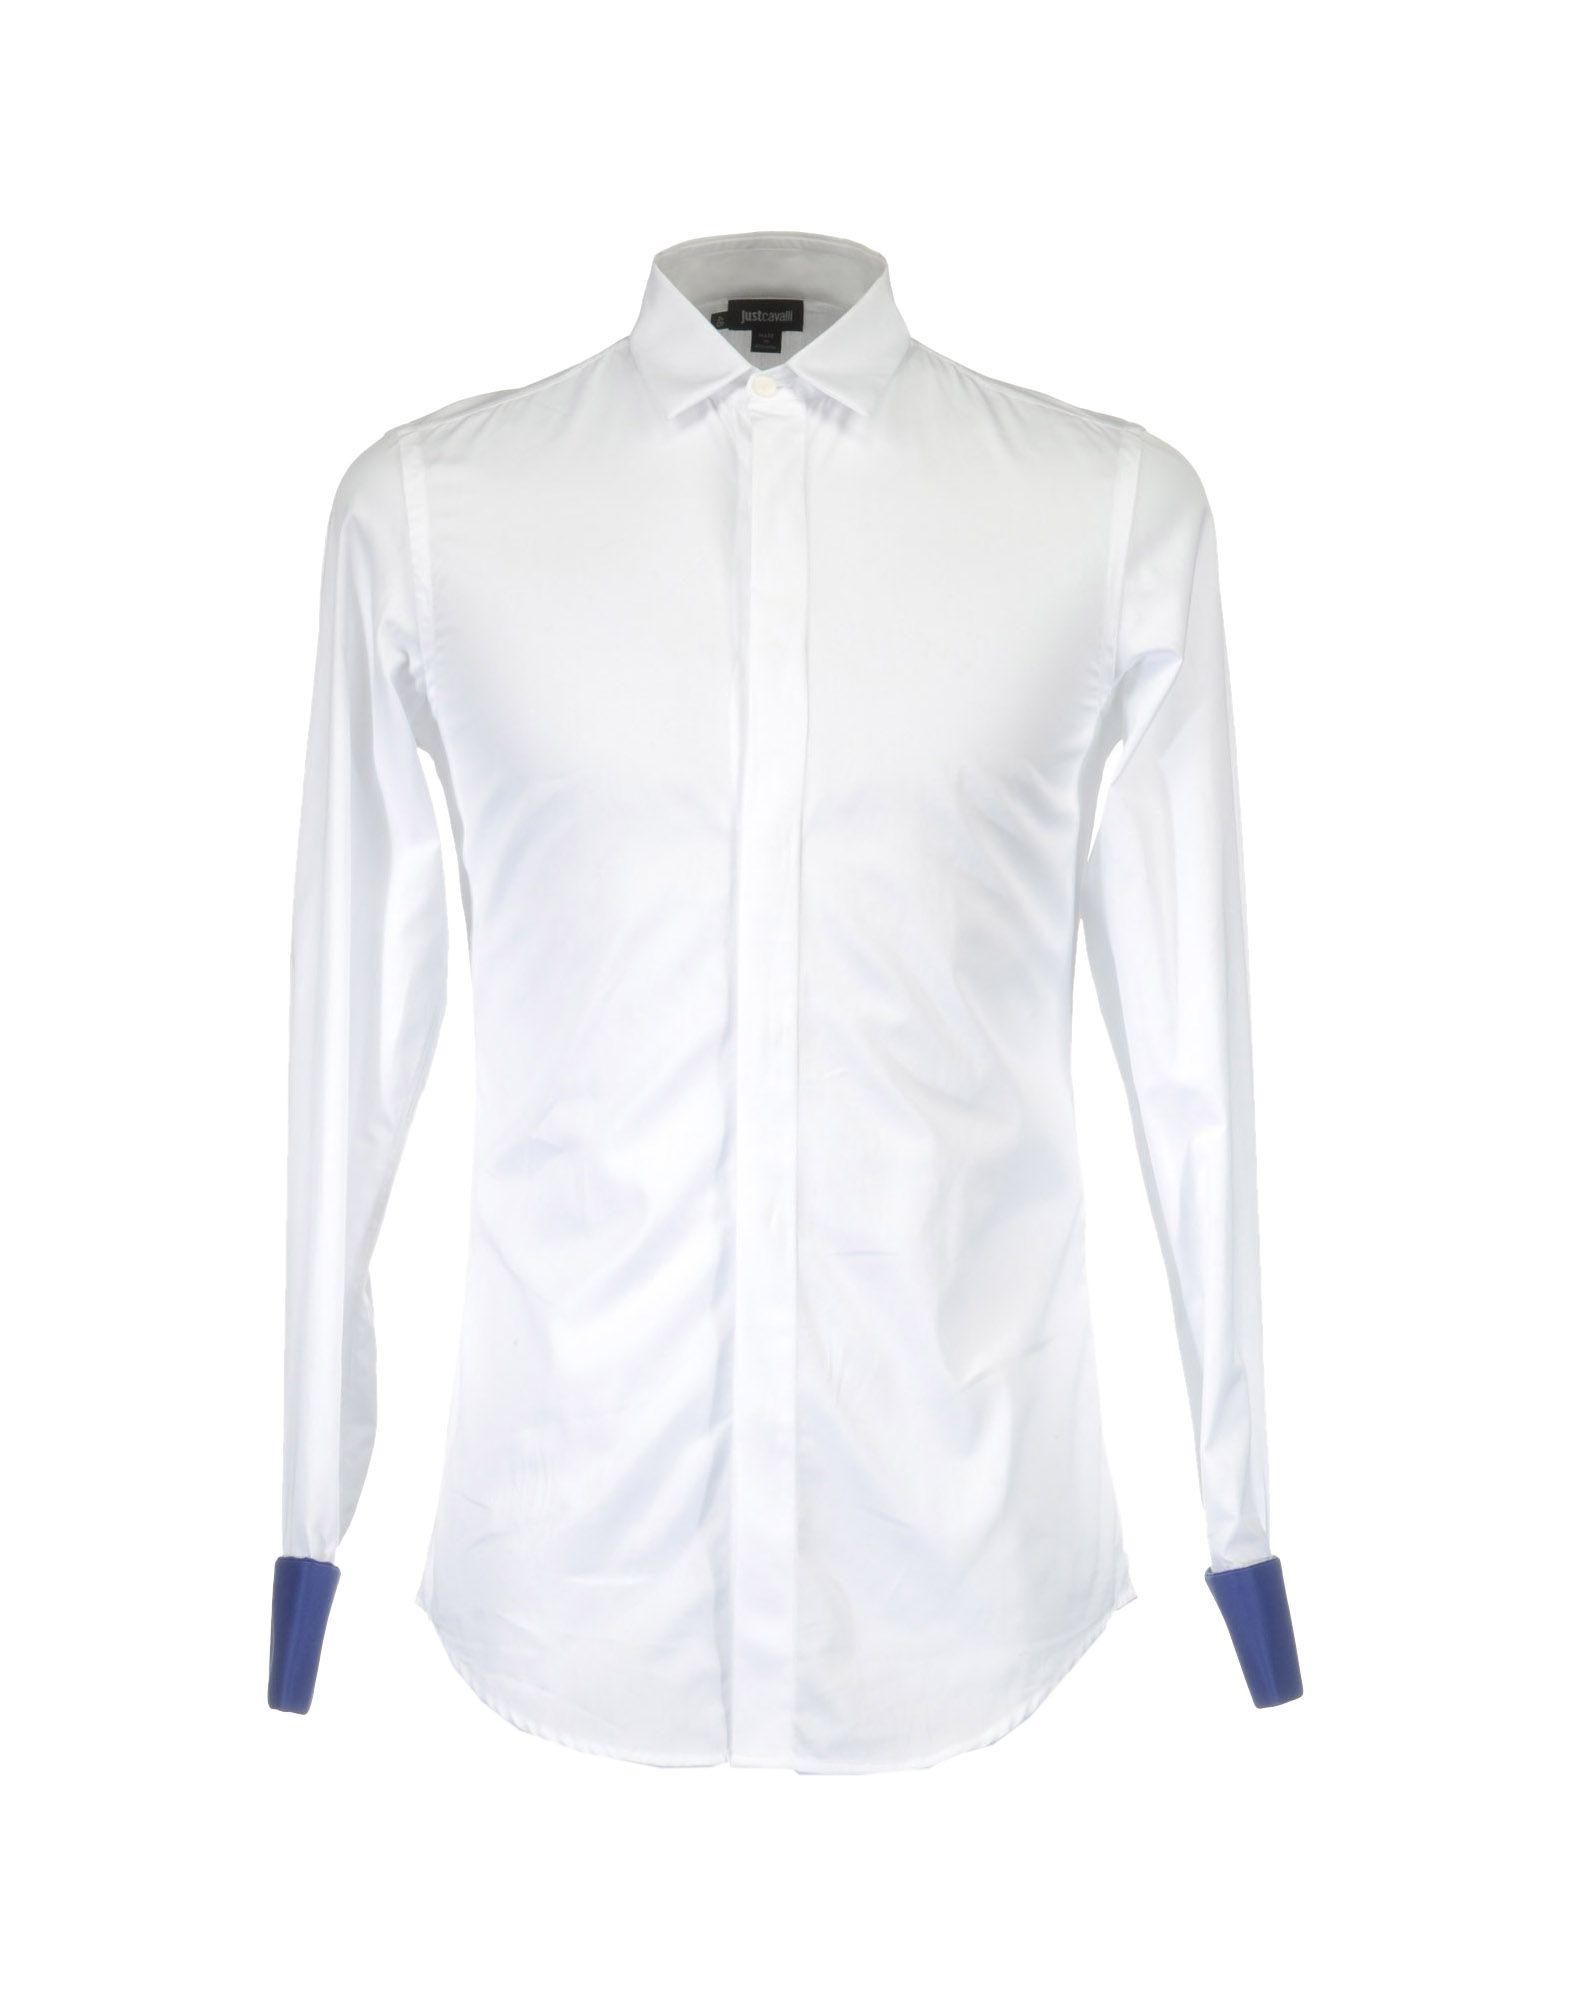 Фото - JUST CAVALLI Рубашка с длинными рукавами рубашка однотонная с длинными рукавами